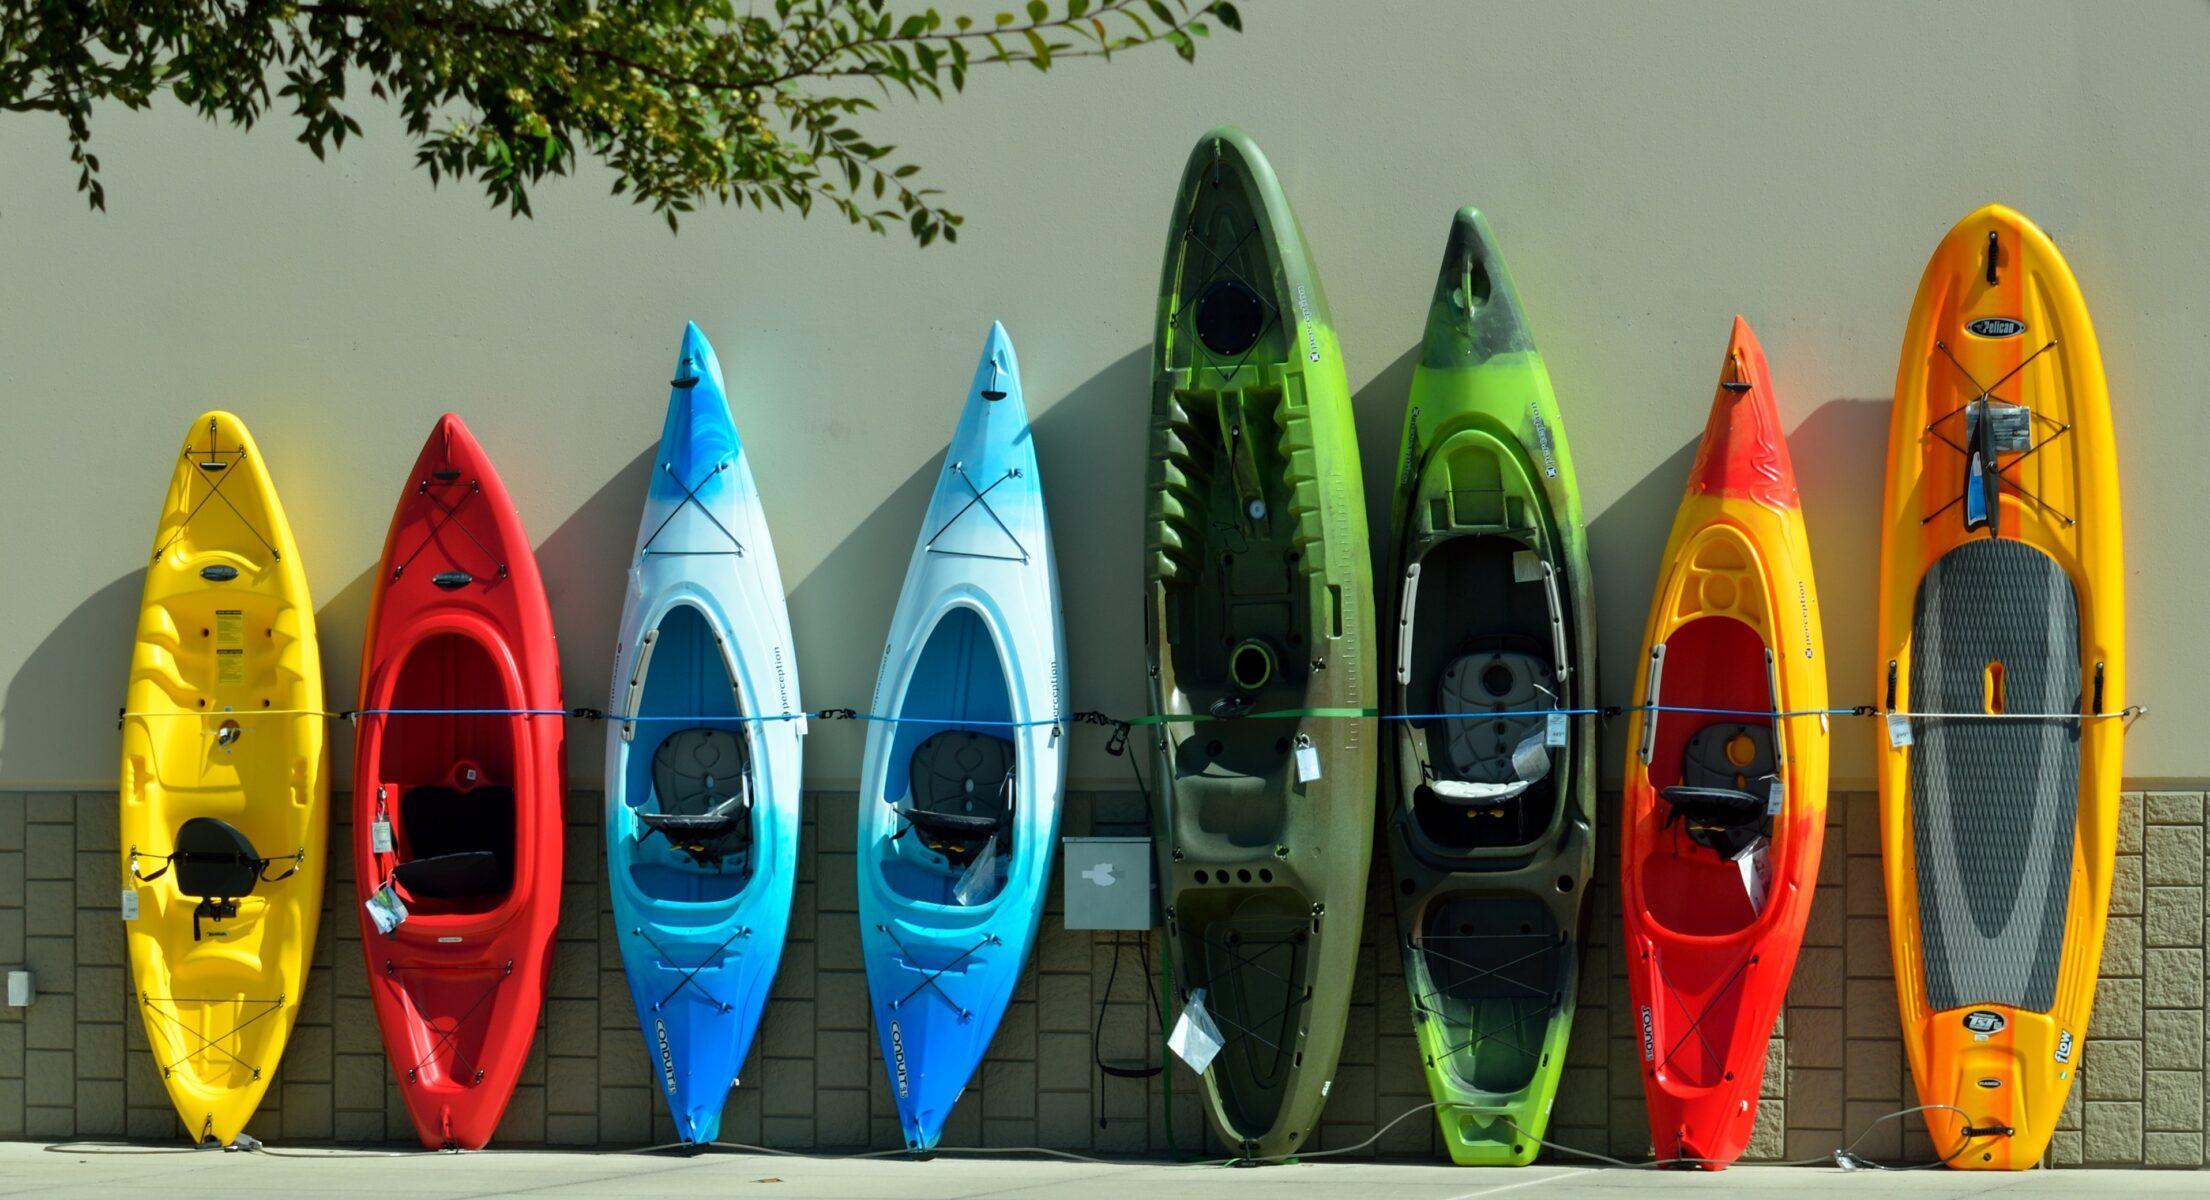 Eco Friendly Kayak Water Sport Boat